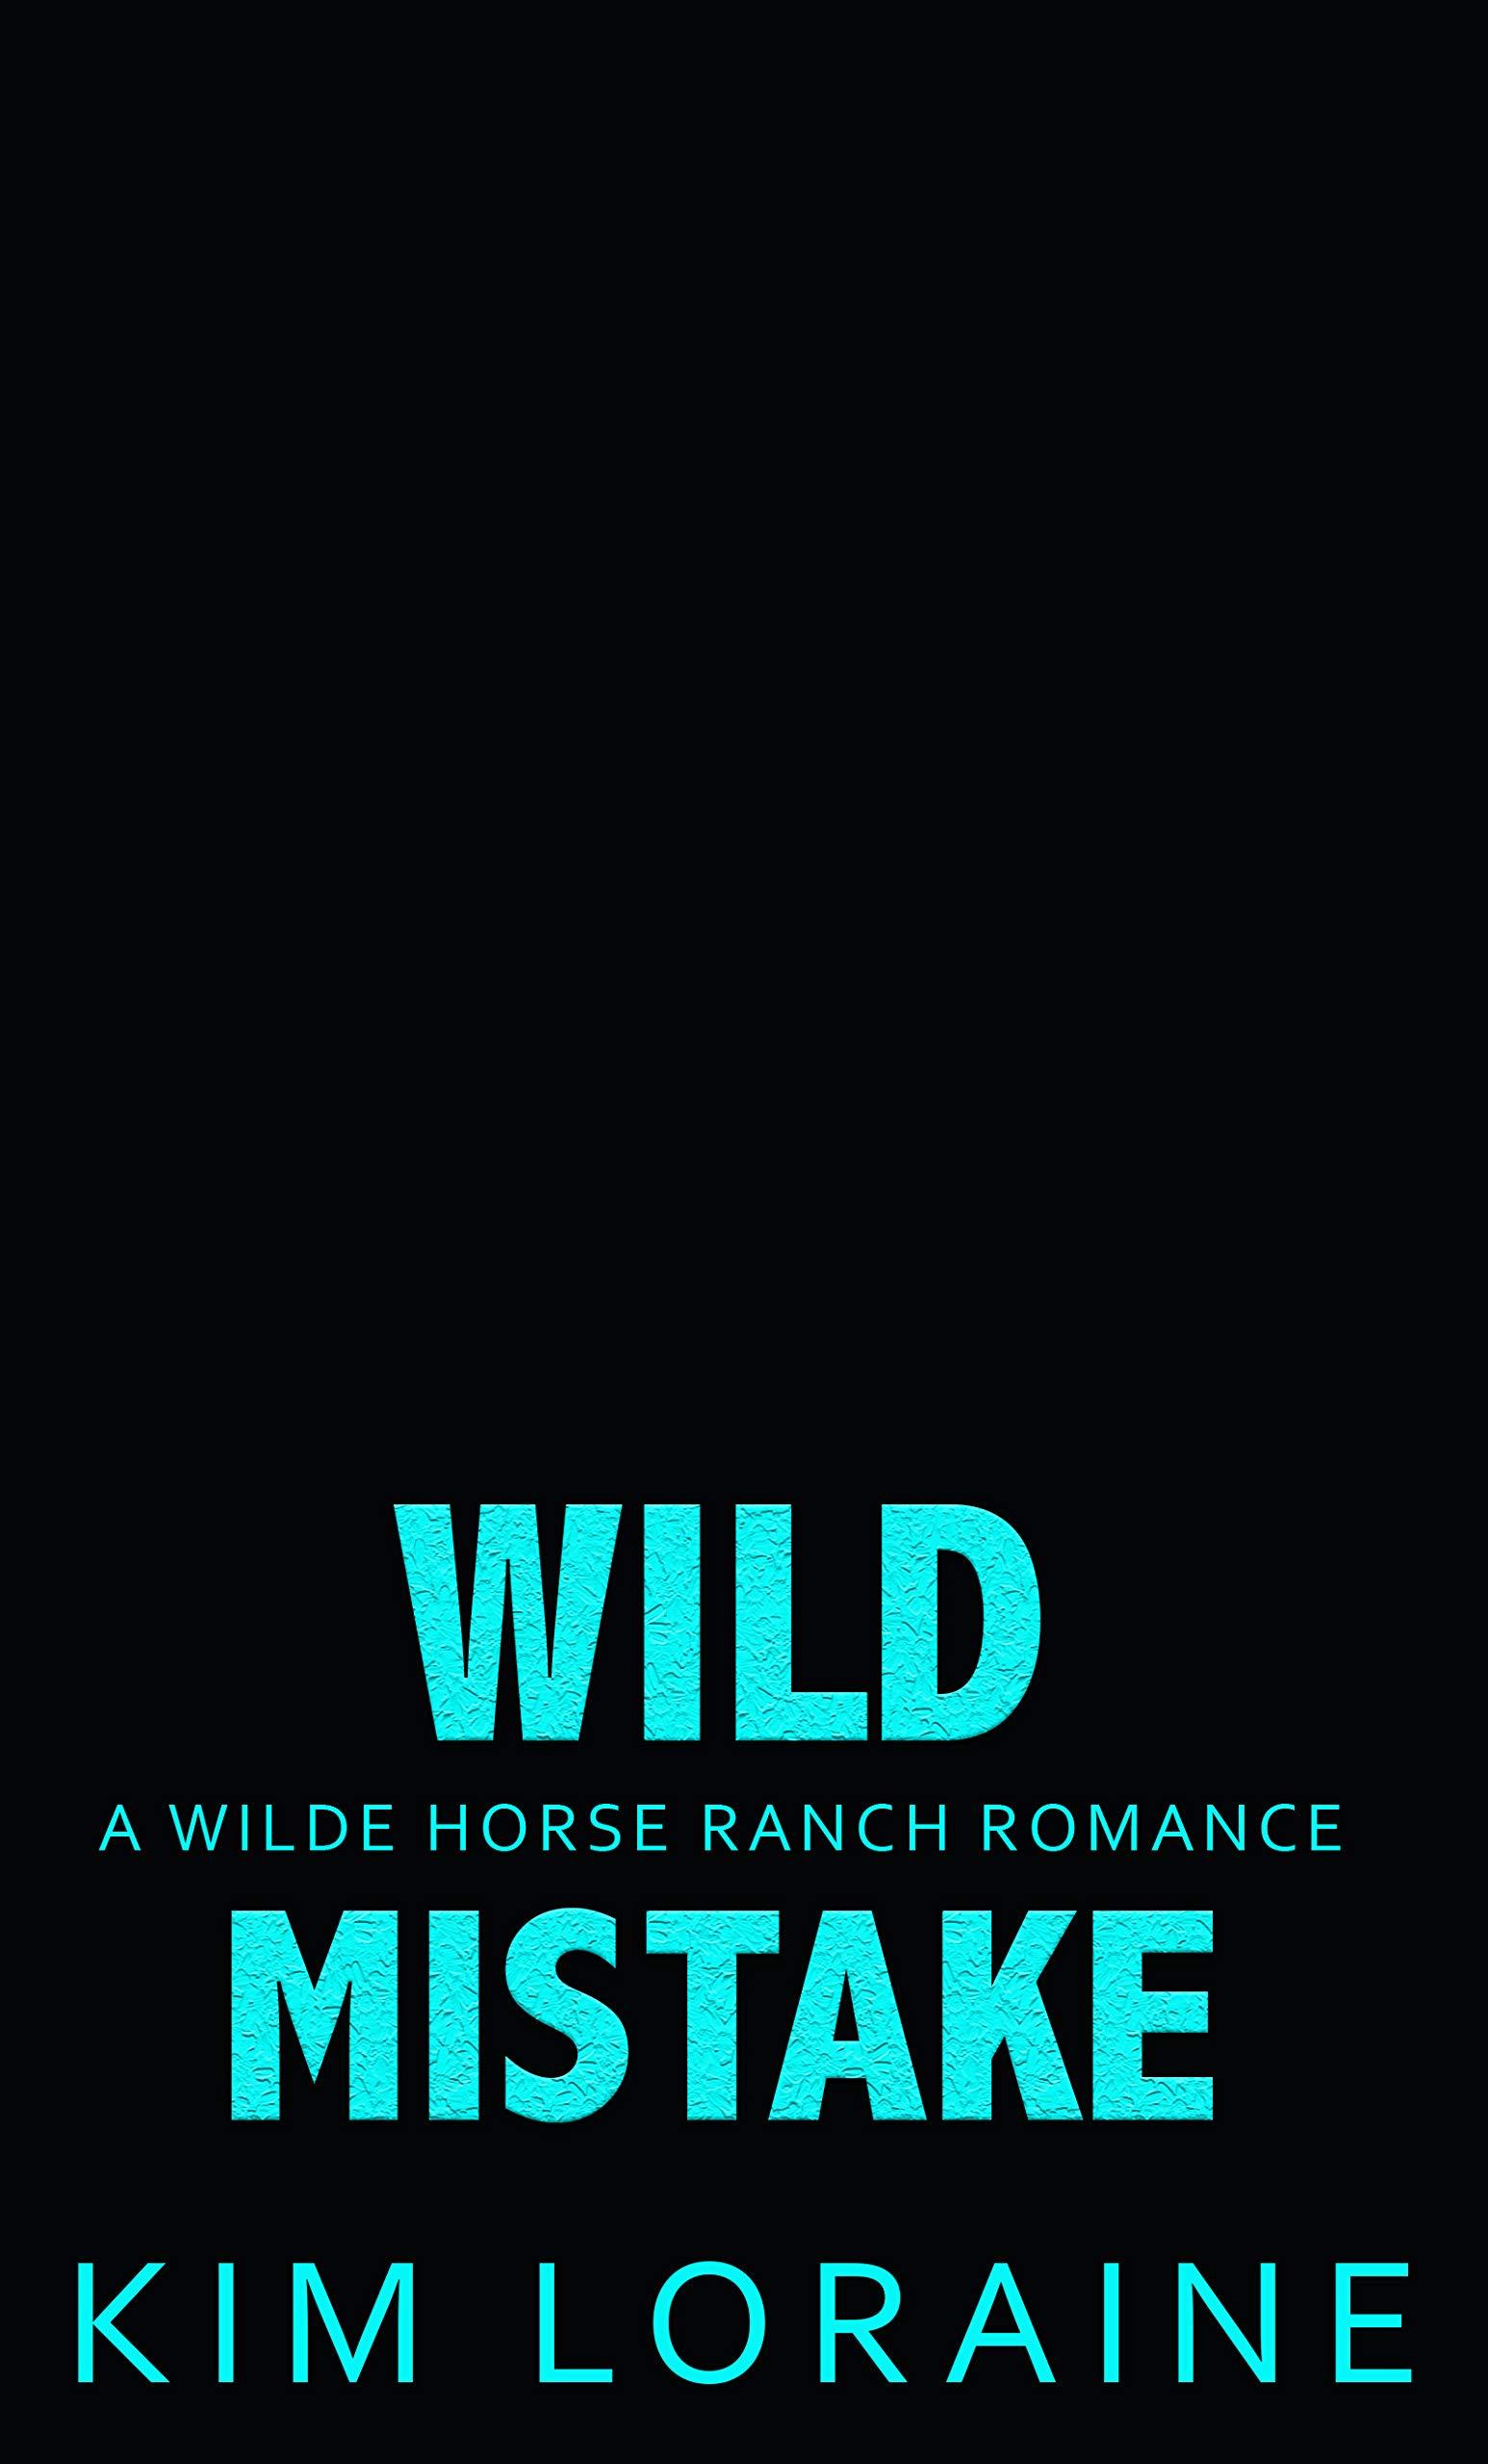 Wild Mistake: A Best Friend's Little Sister Romance (Wilde Horse Ranch Book 3)